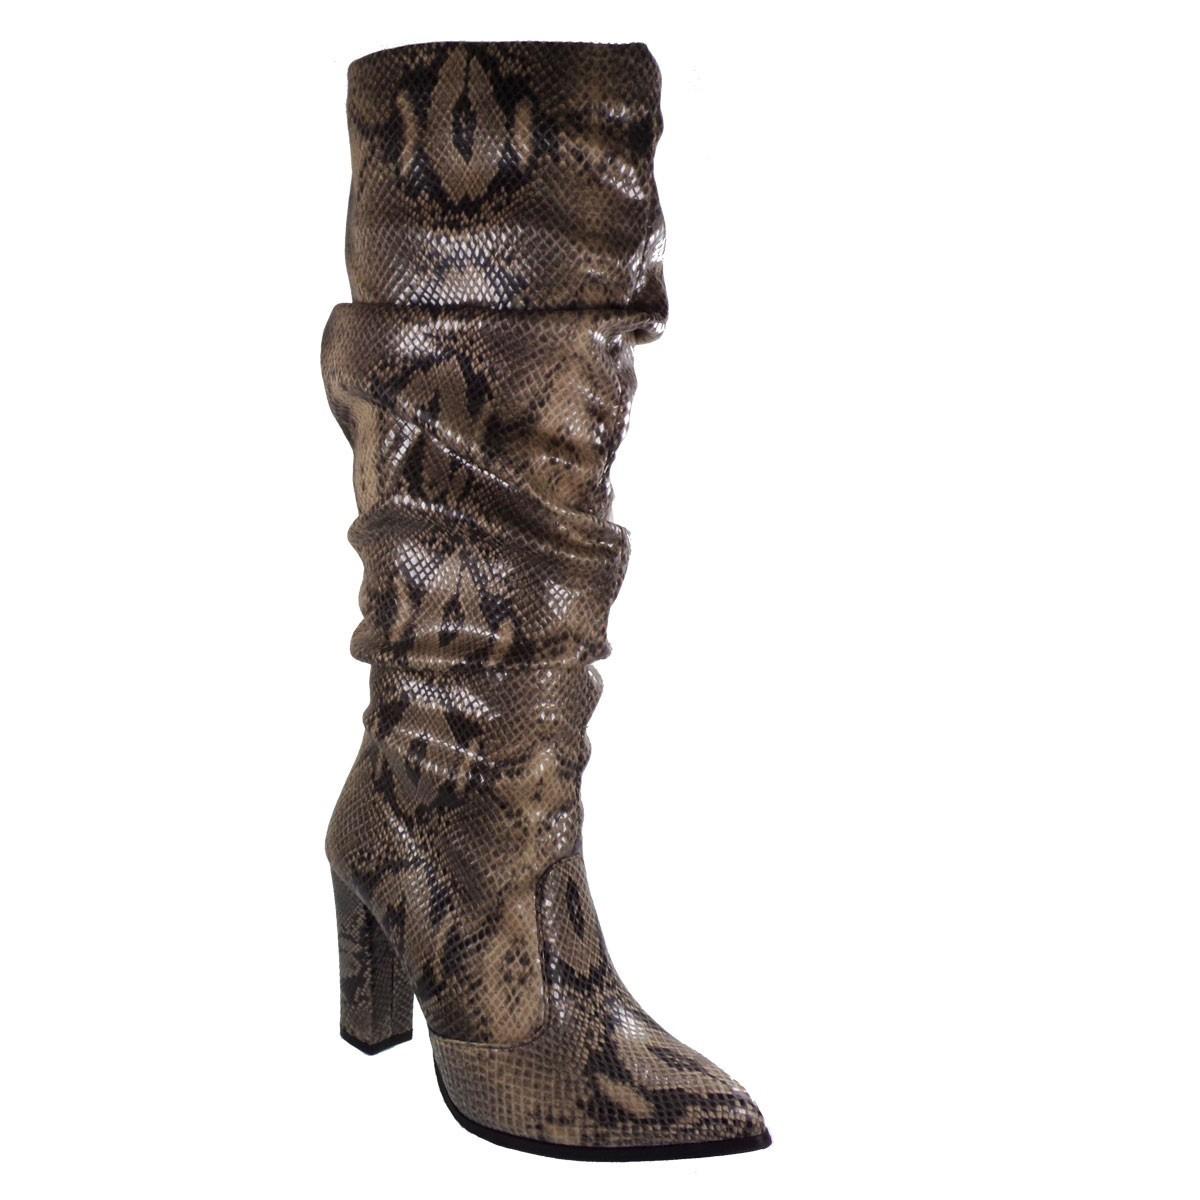 3730c50098 Katia Shoes Γυναικεία Παπούτσια Μπότα Γ-116-4973 Μπέζ Φίδι ...